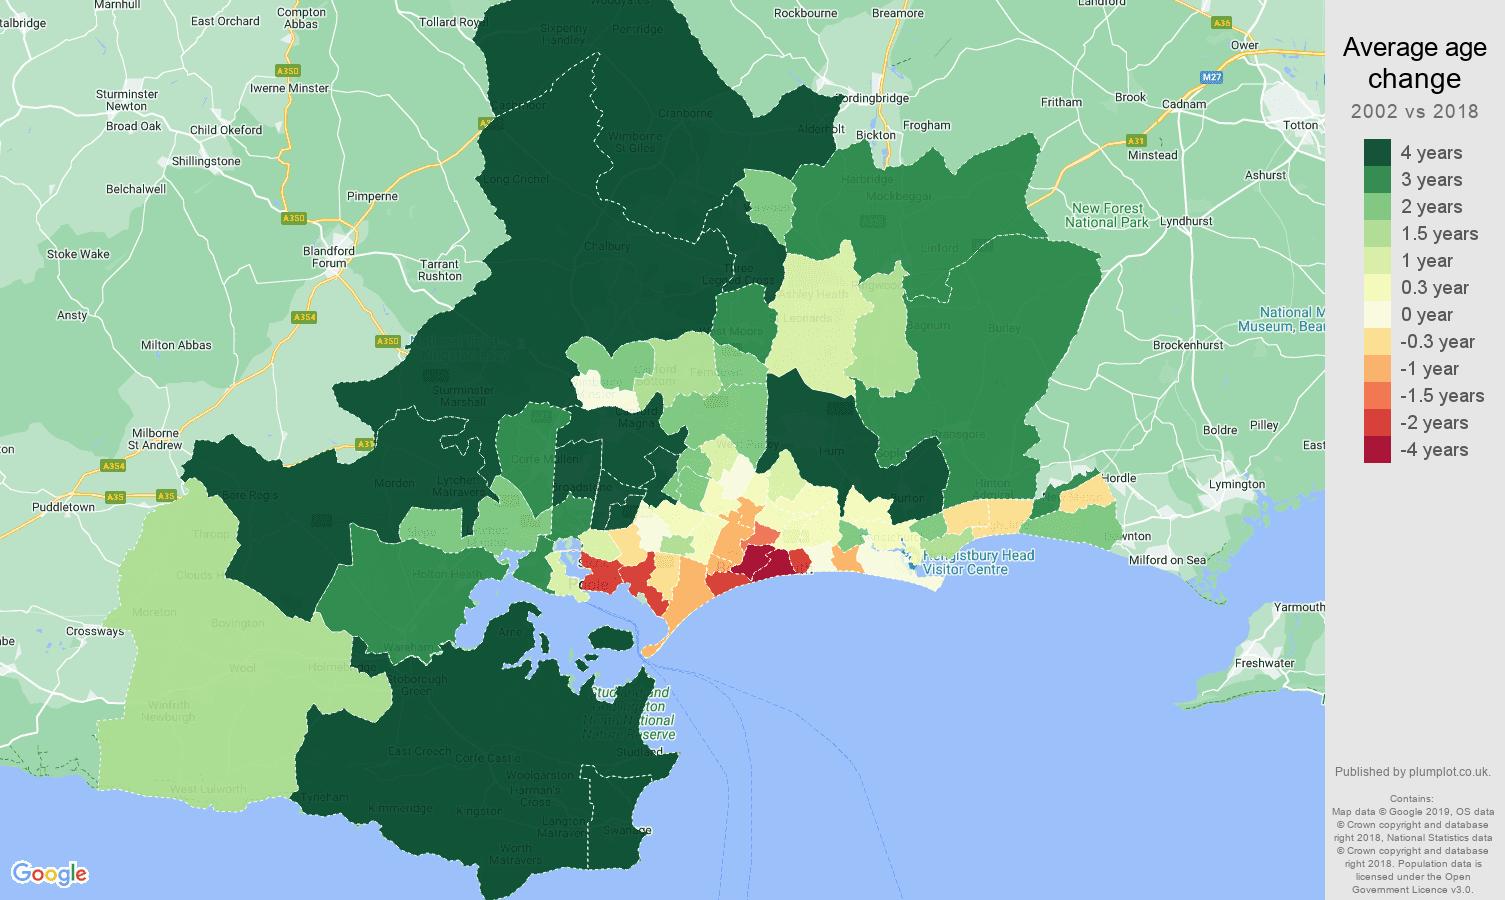 Bournemouth average age change map